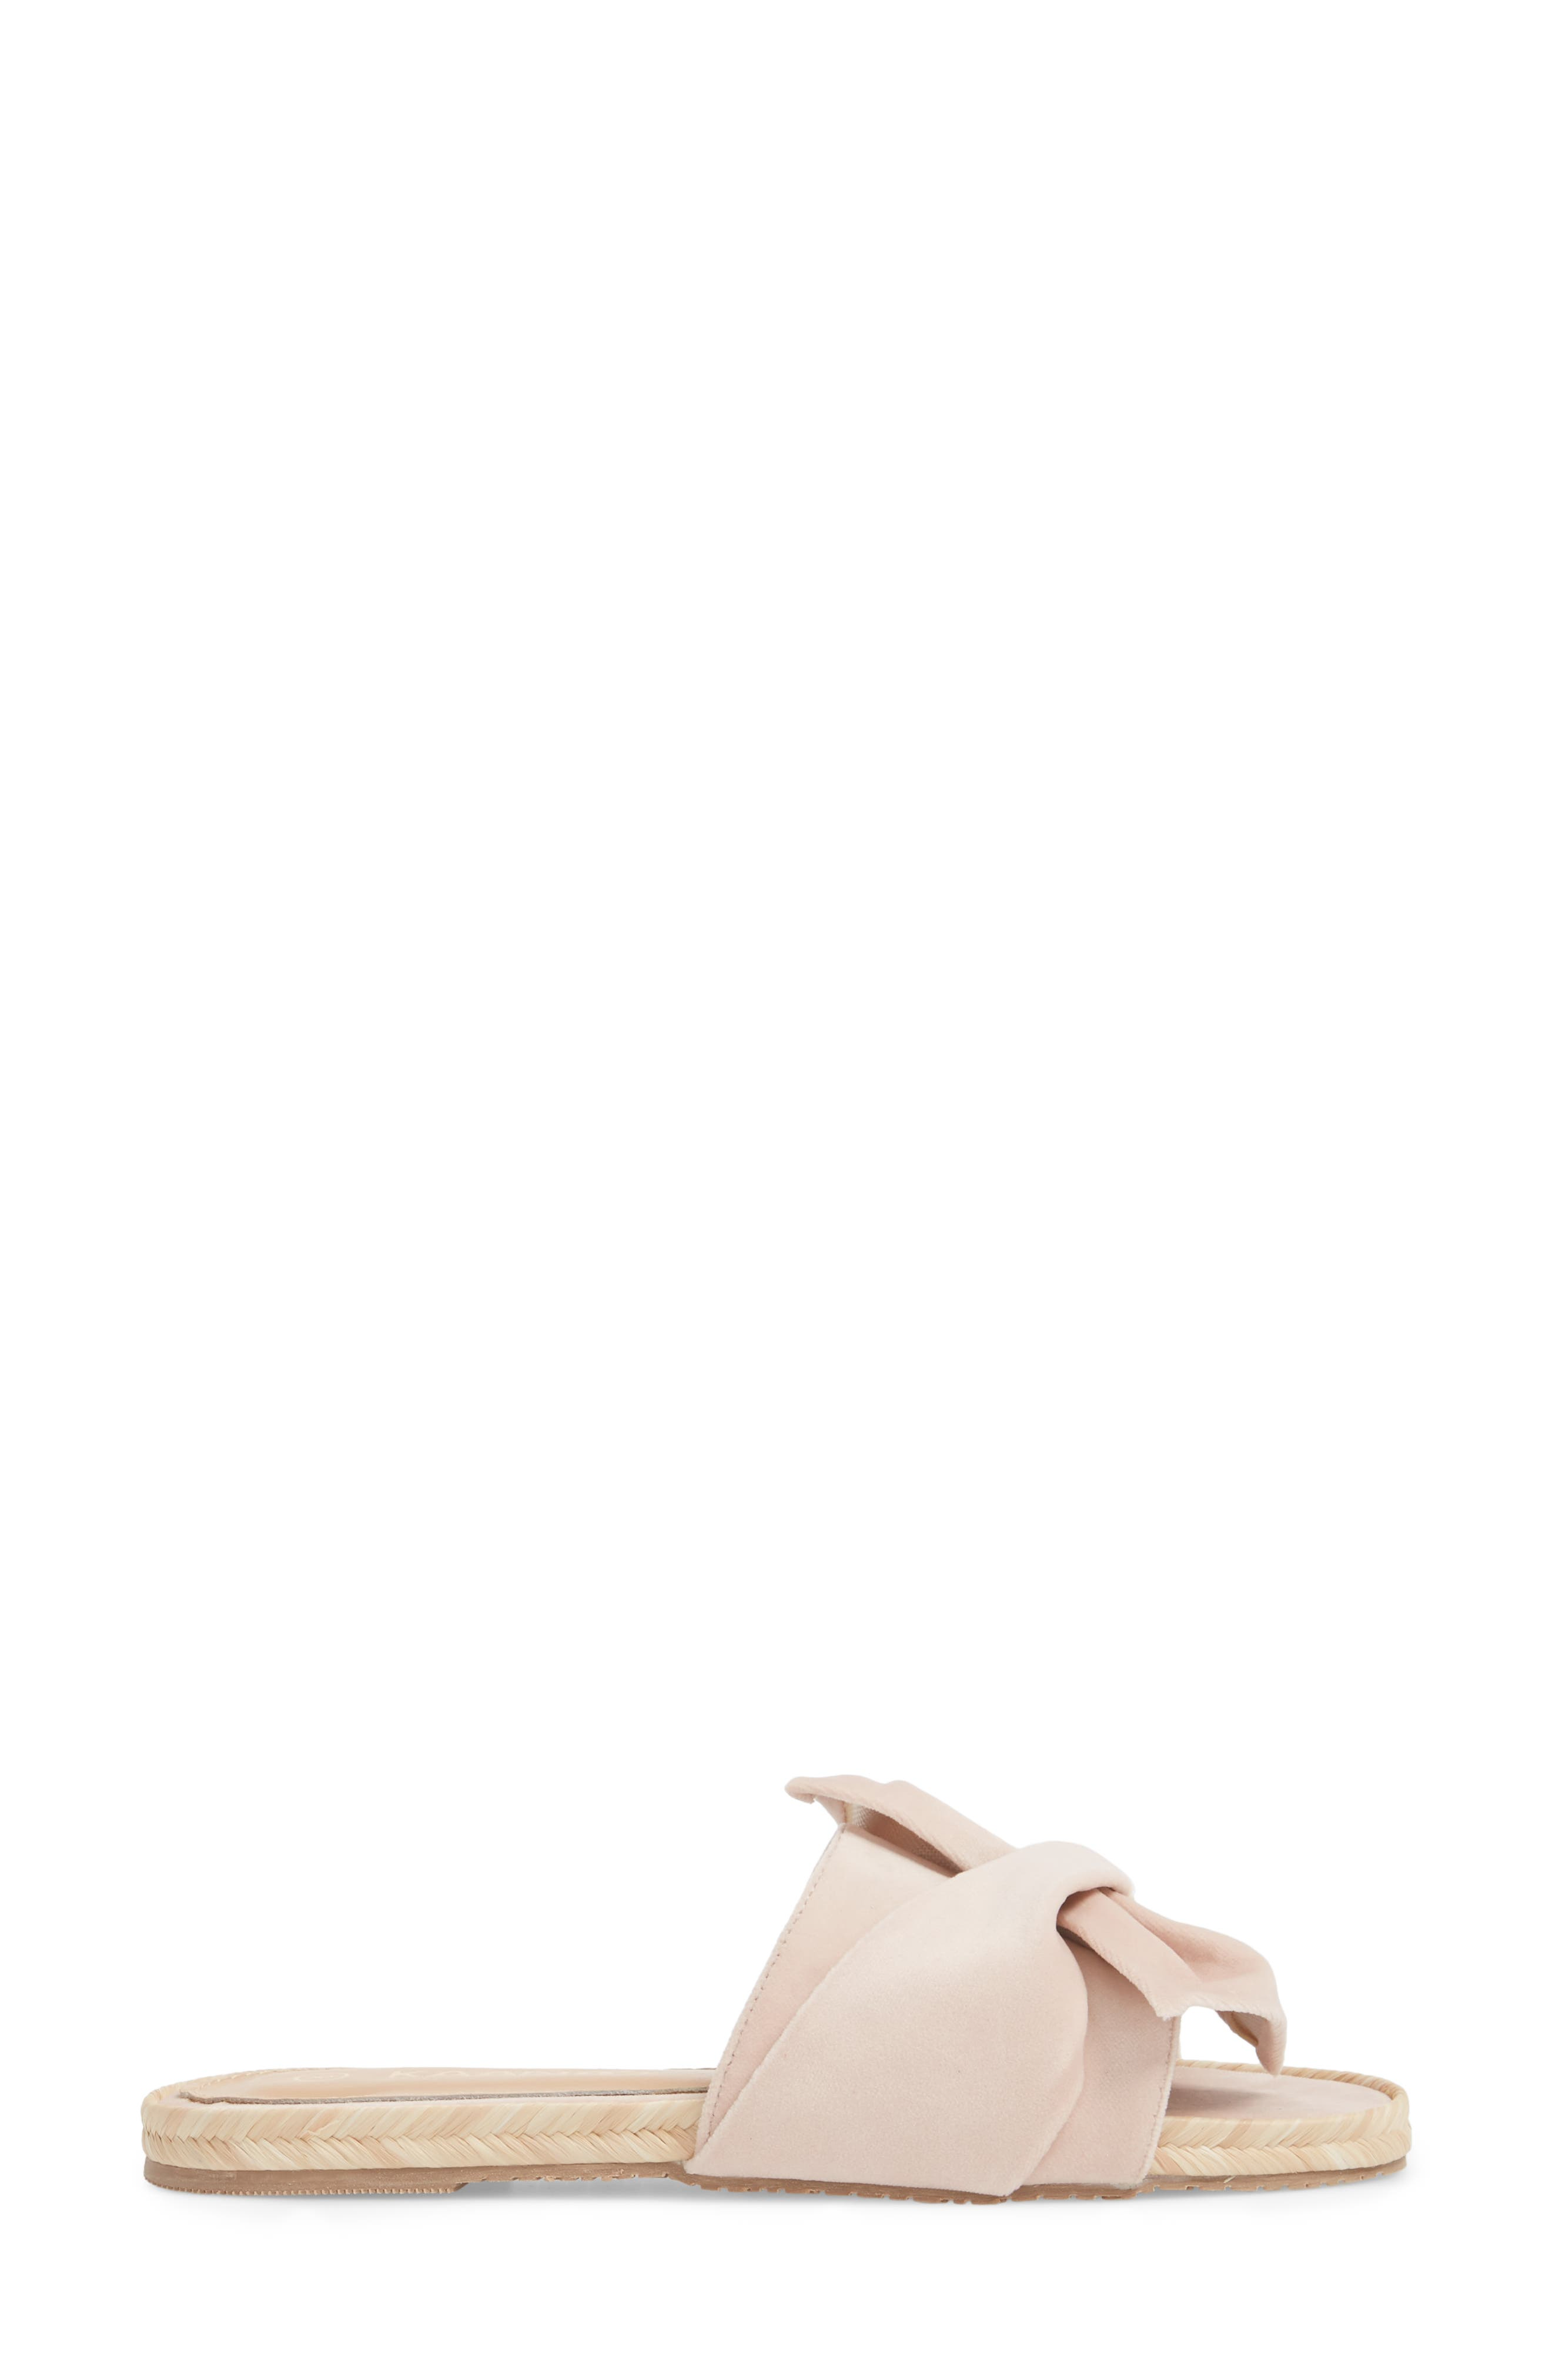 Sausalito Knotted Slide Sandal,                             Alternate thumbnail 5, color,